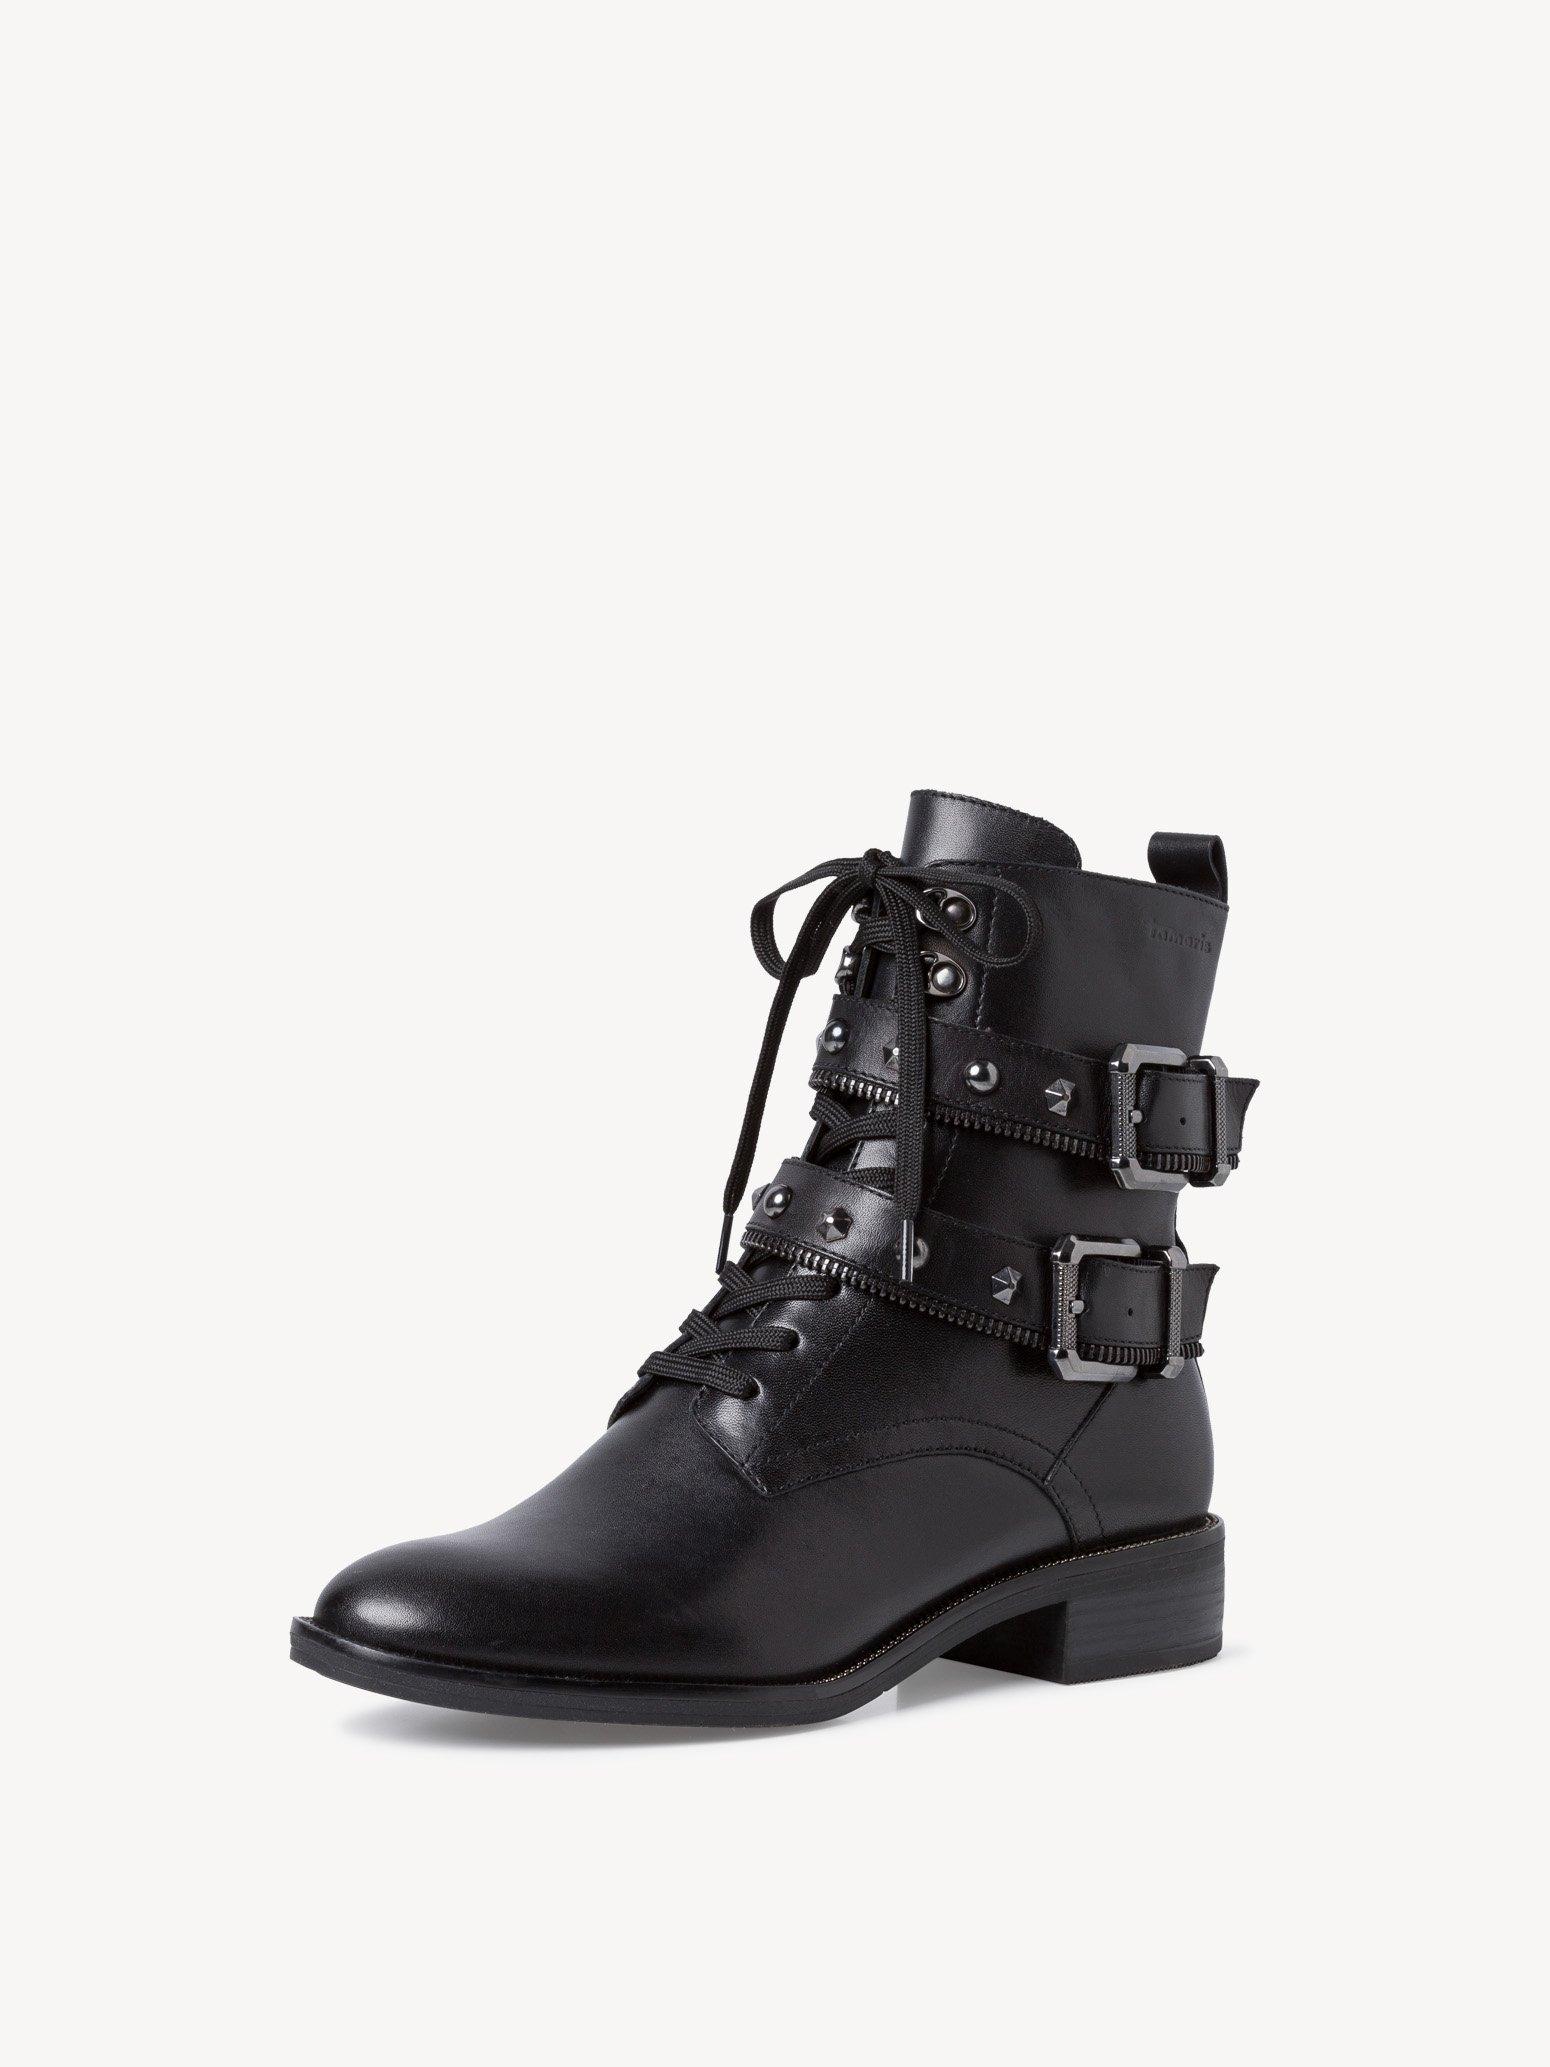 Ботинки Tamaris 1-1-25134-27-003